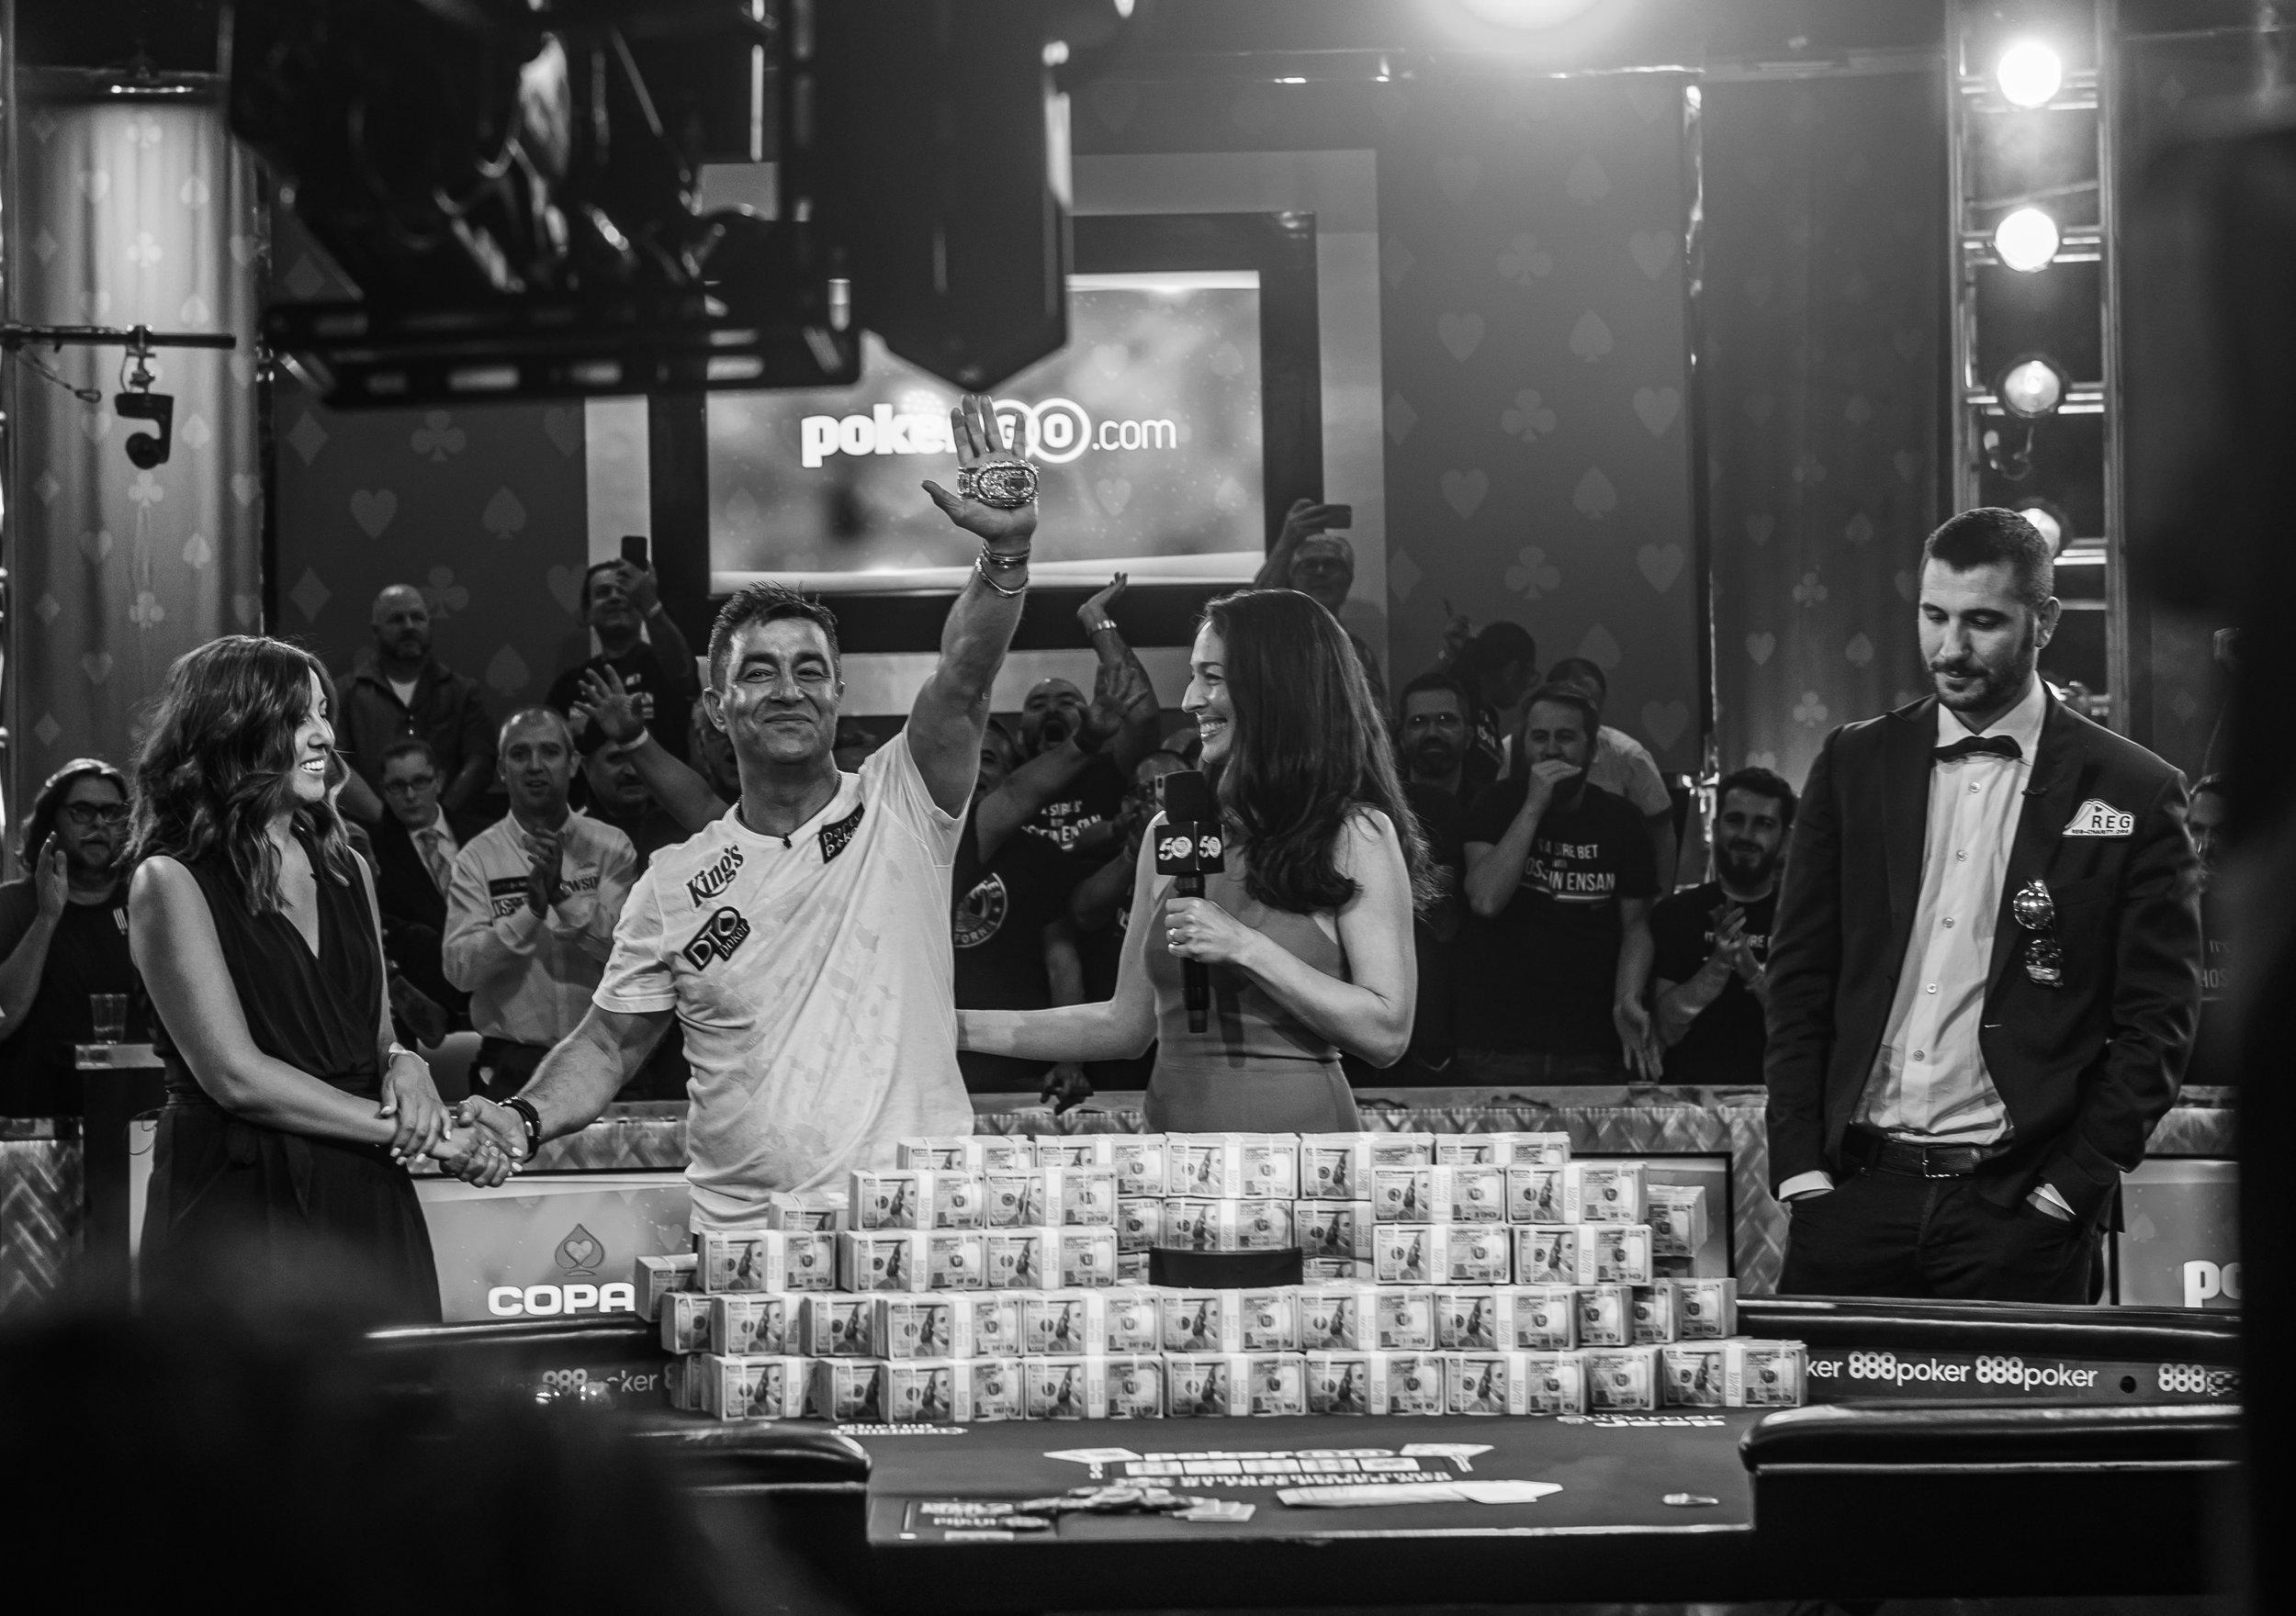 Hossein Ensan Wins the Main Event_2019 WSOP_ATA_9208.jpg